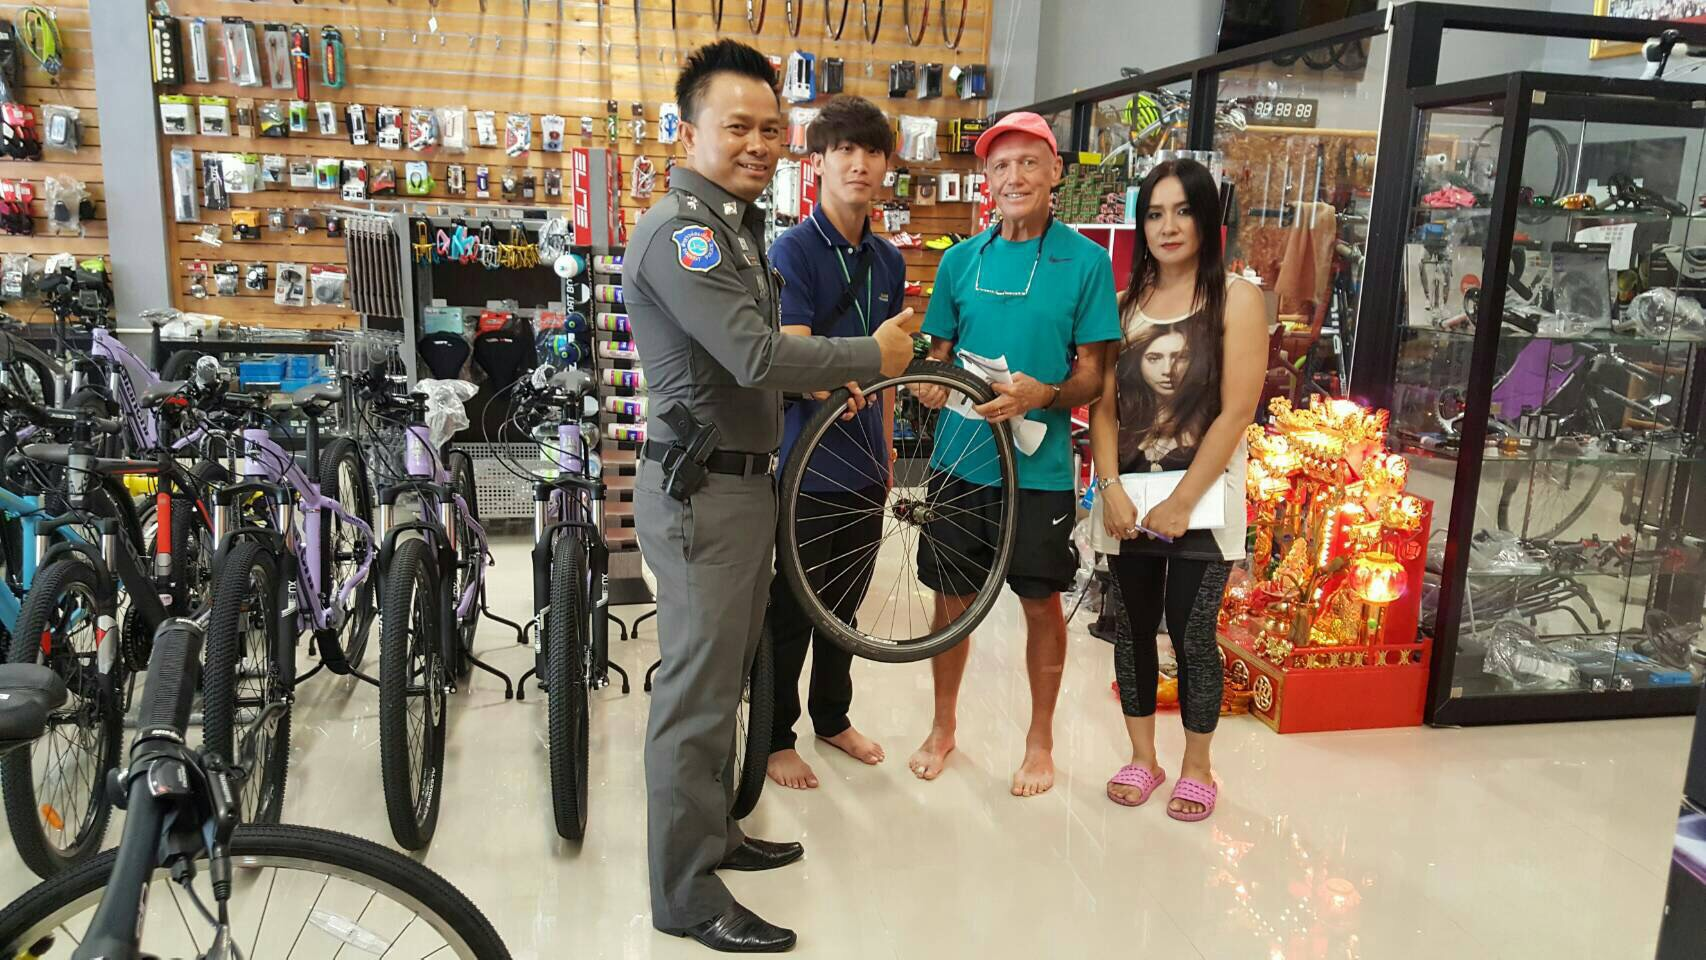 Australian Rodney Arthur Ellis was happy to get his bike repaired thanks to Pattaya's Tourist Police.